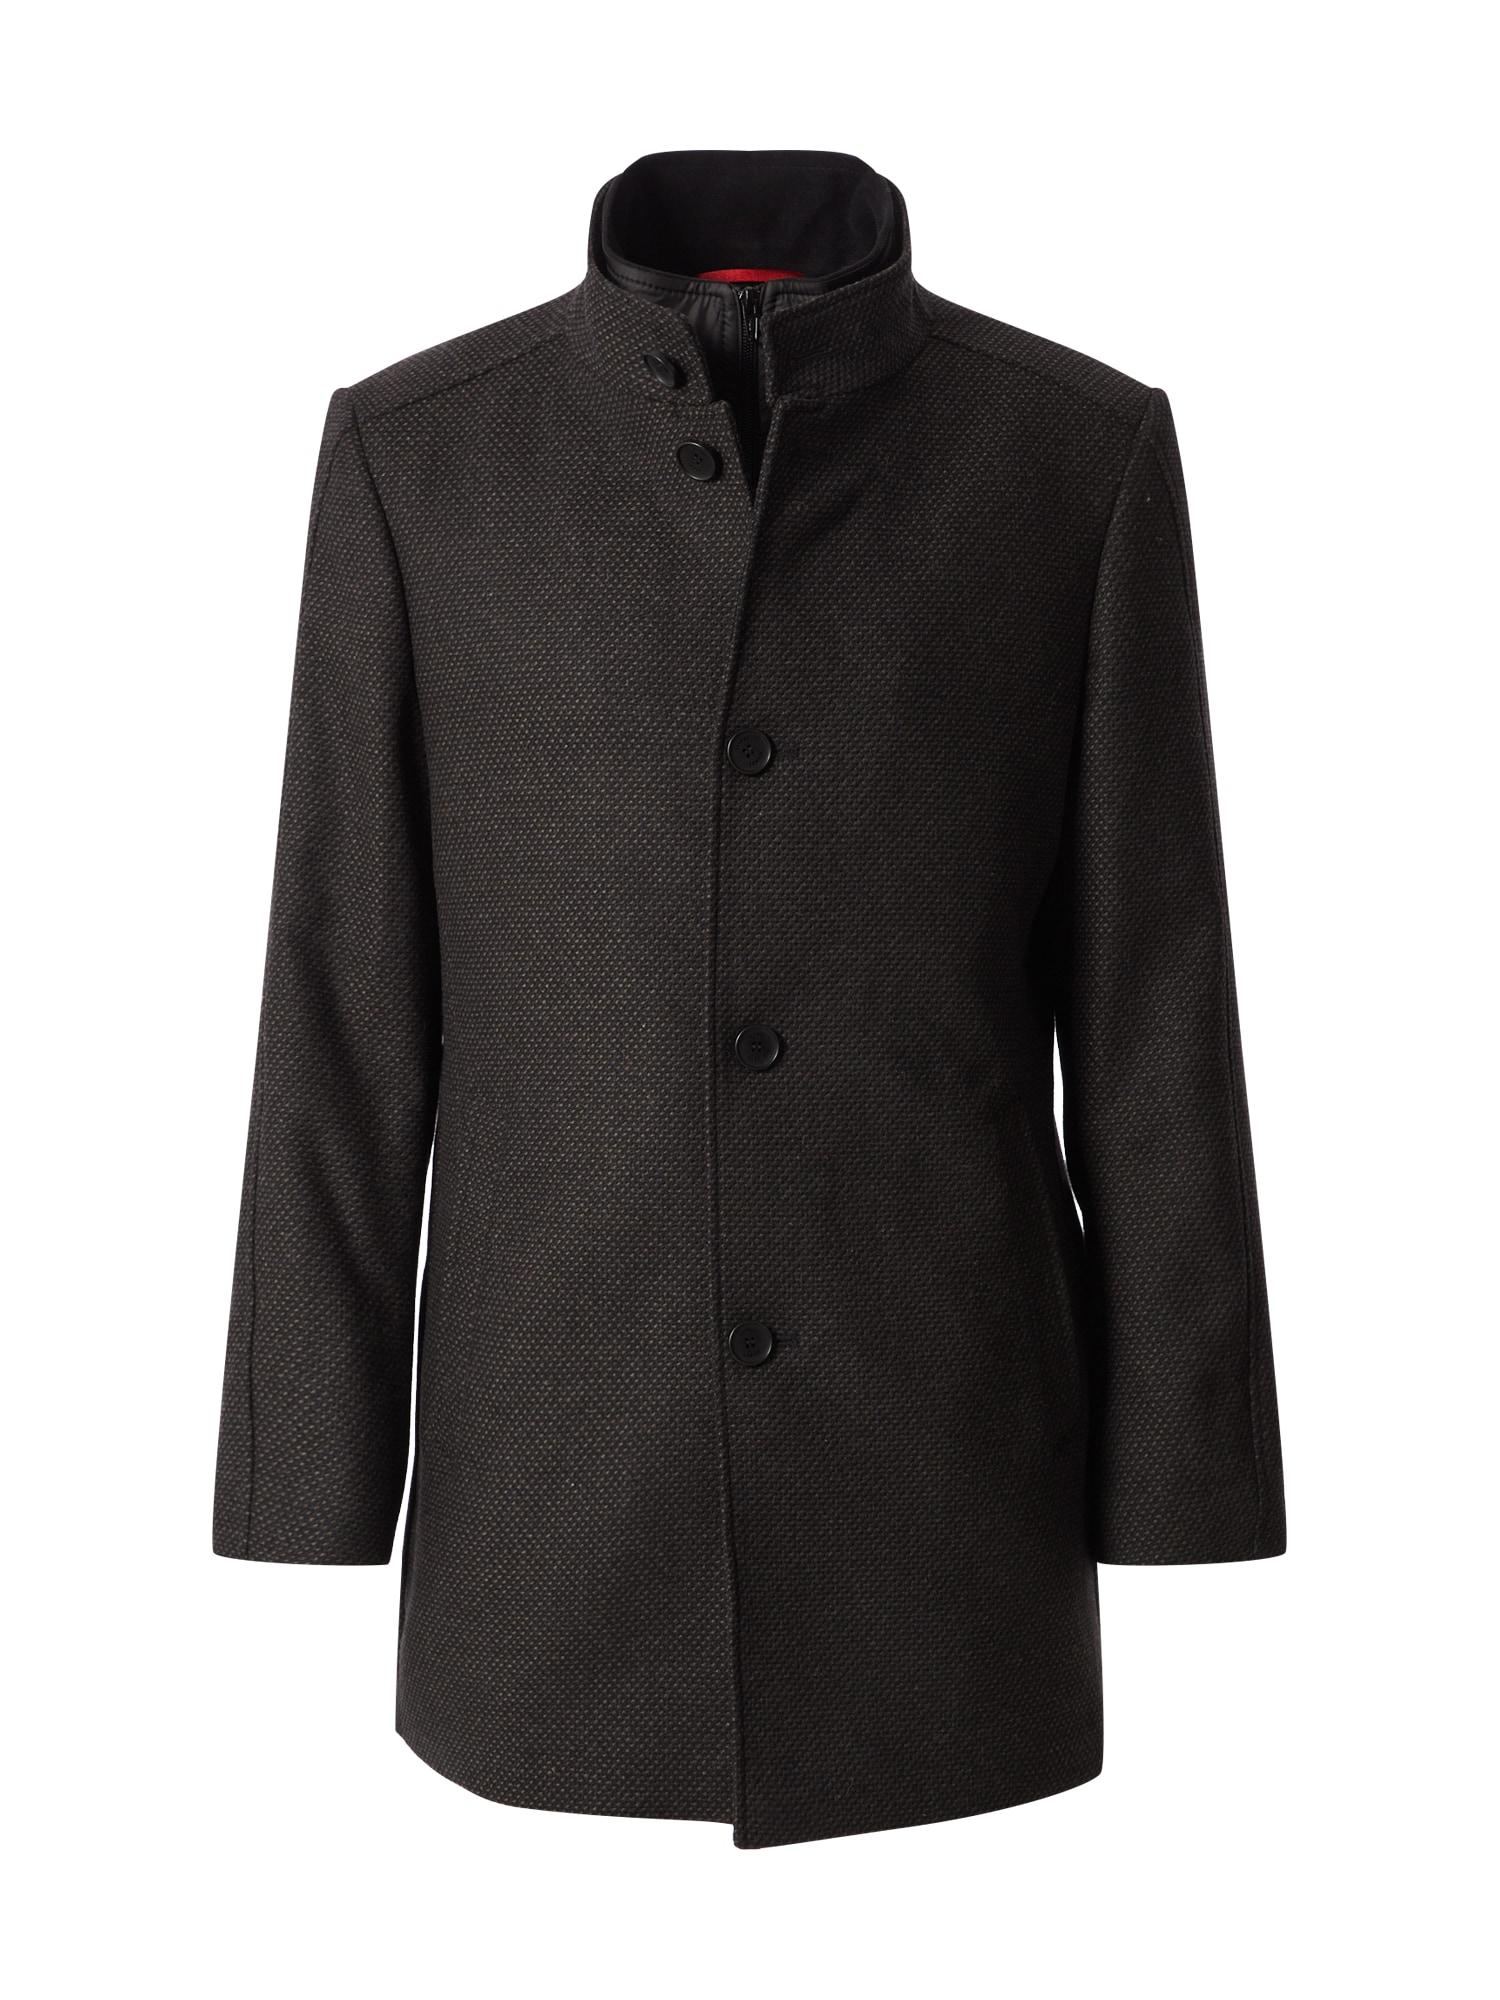 CINQUE Rudeninis-žieminis paltas tamsiai ruda